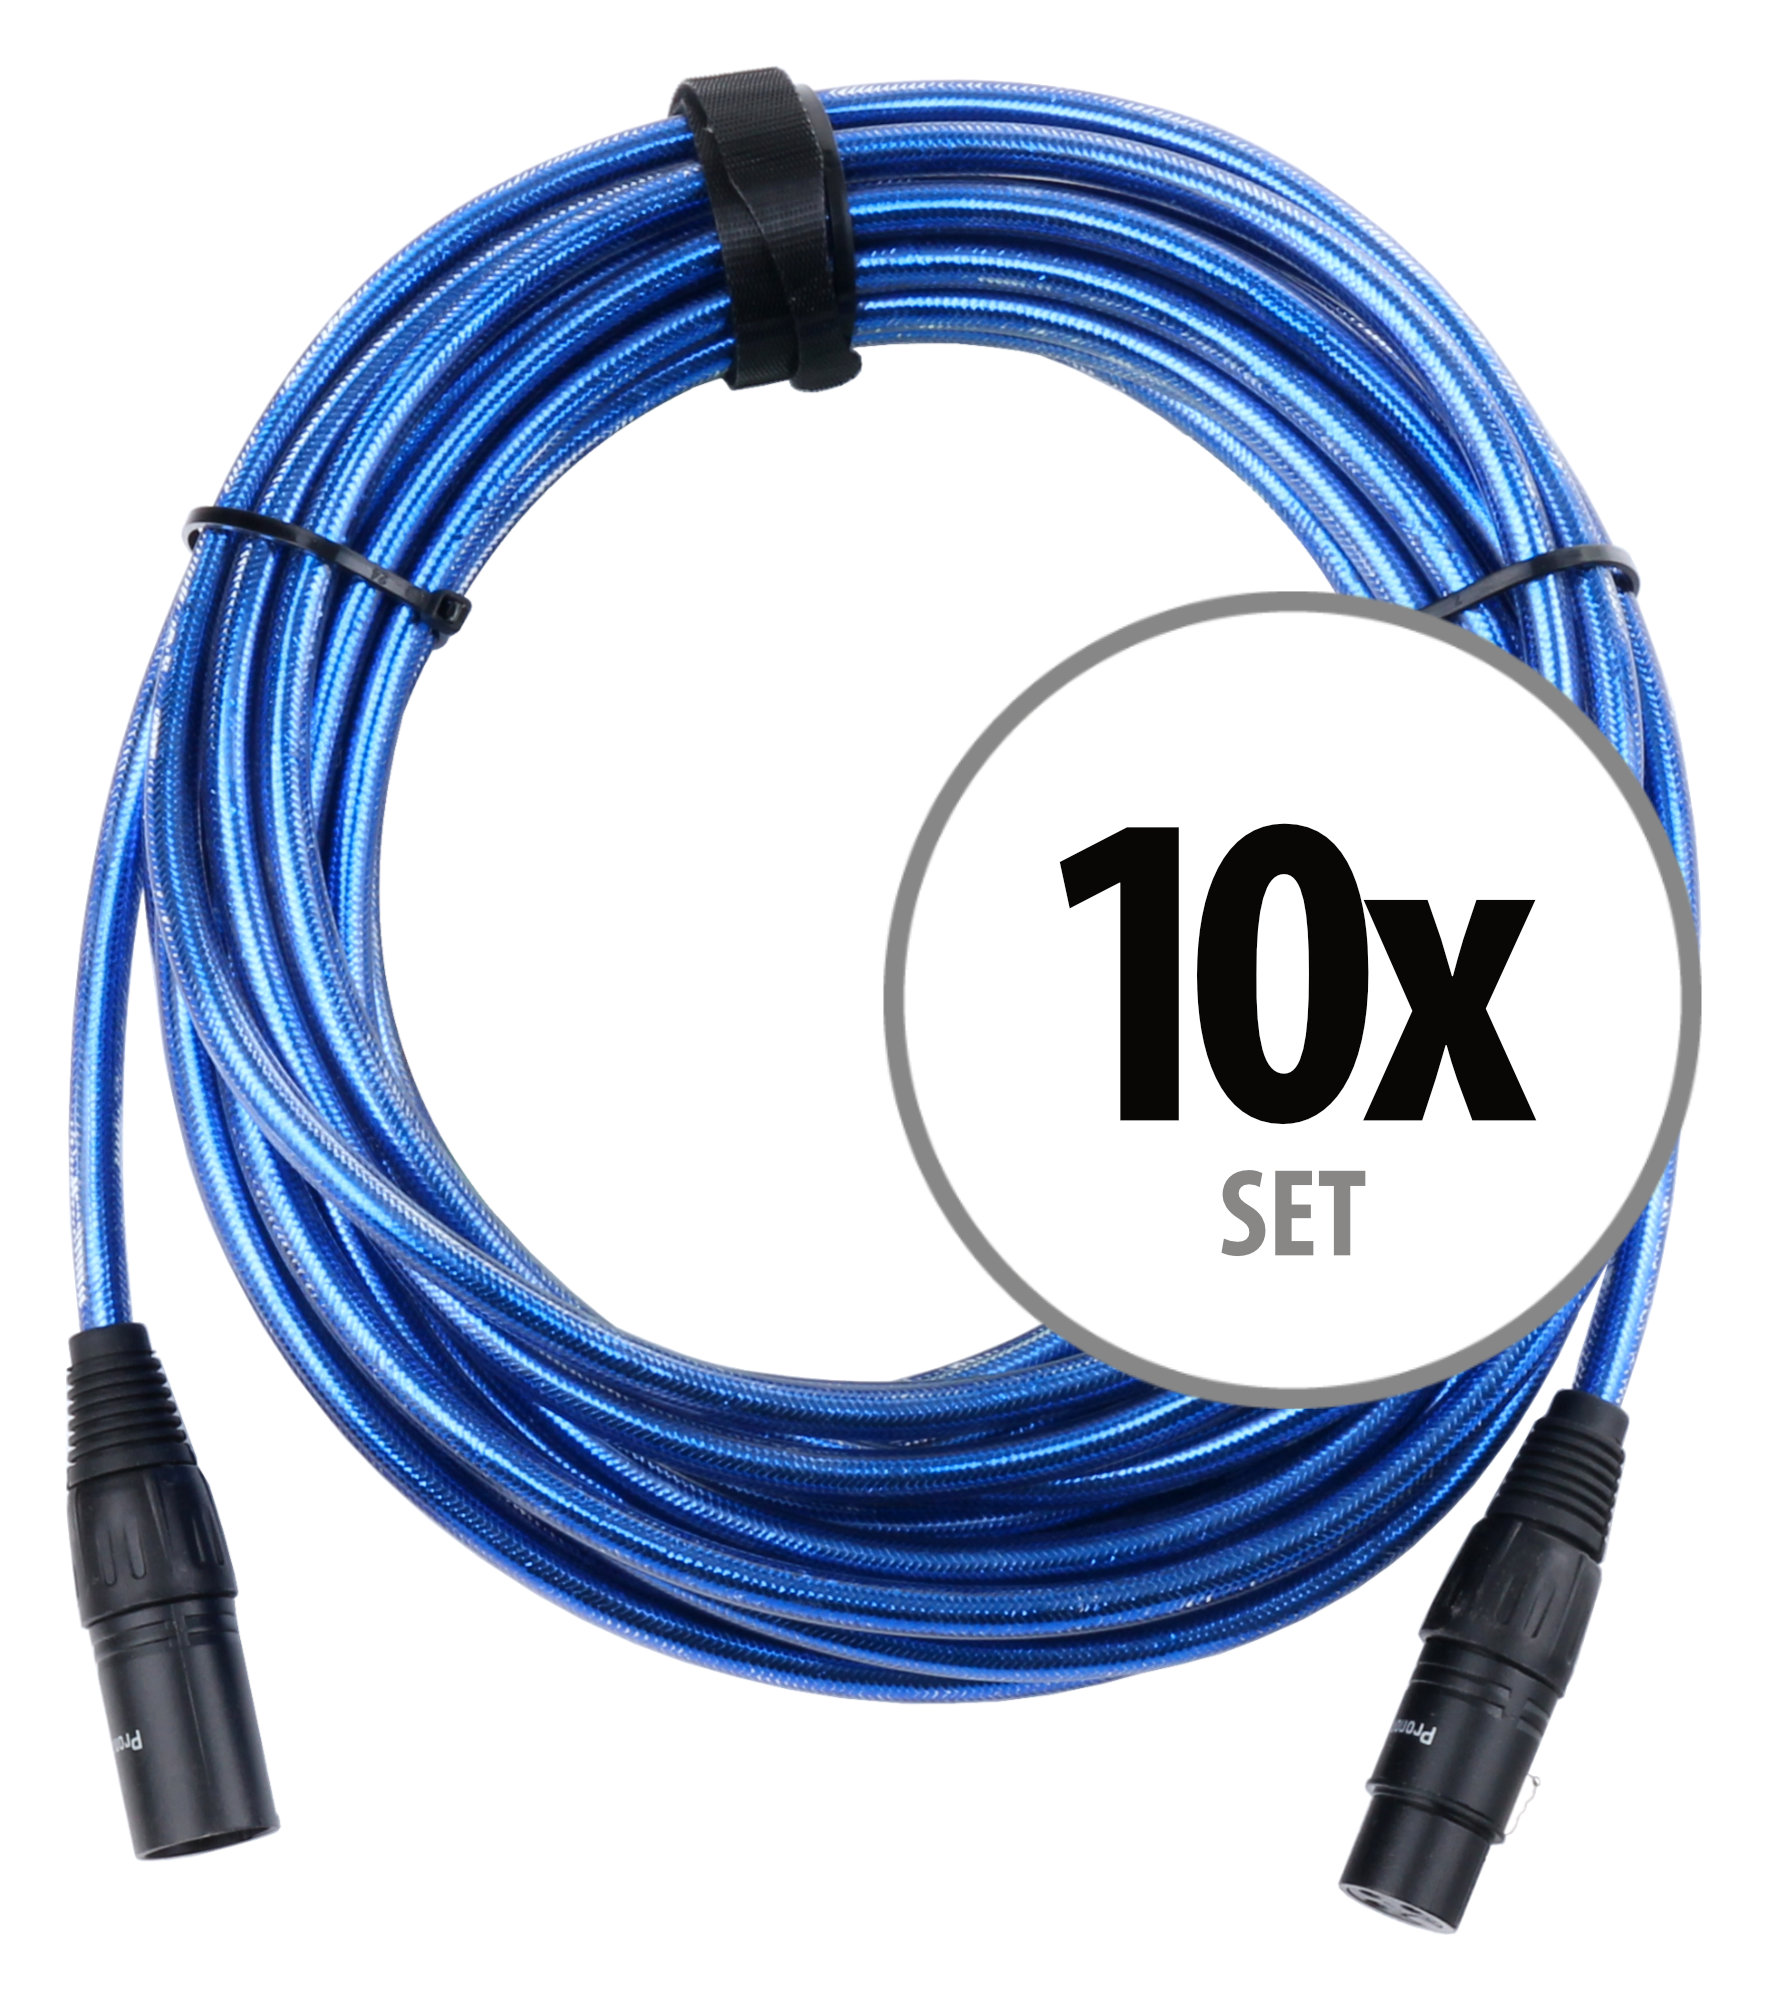 Pronomic Stage XFXM-Blue-10 Microphone Cable XLR 10m Metallic Blue ...